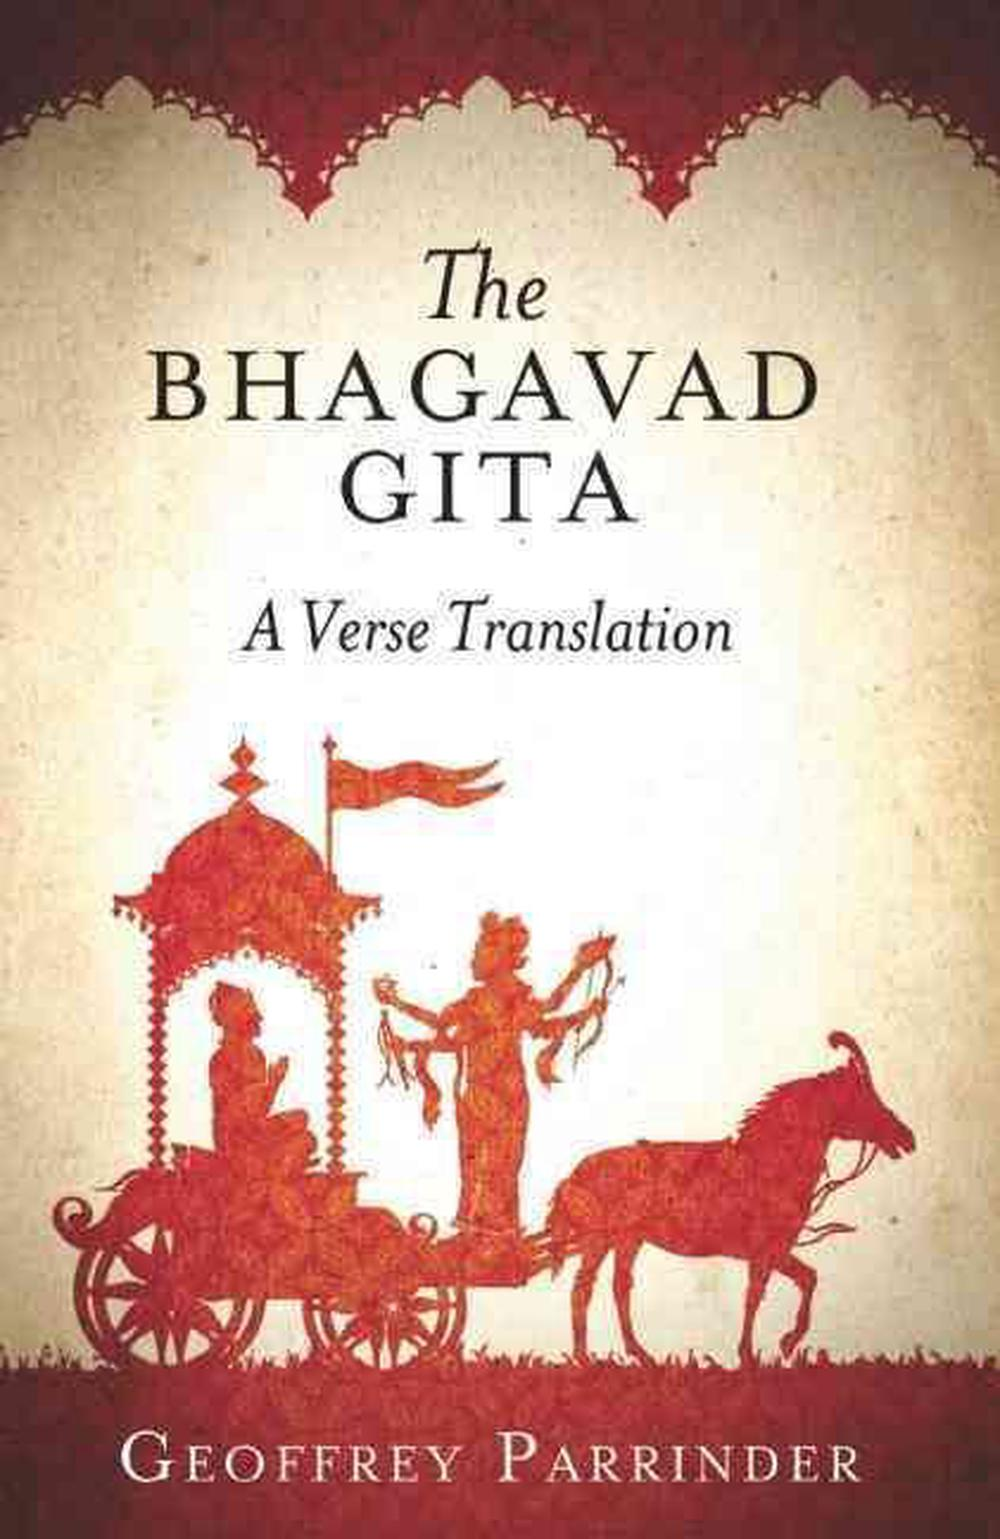 The Bhagavad Gita: A Verse Translation